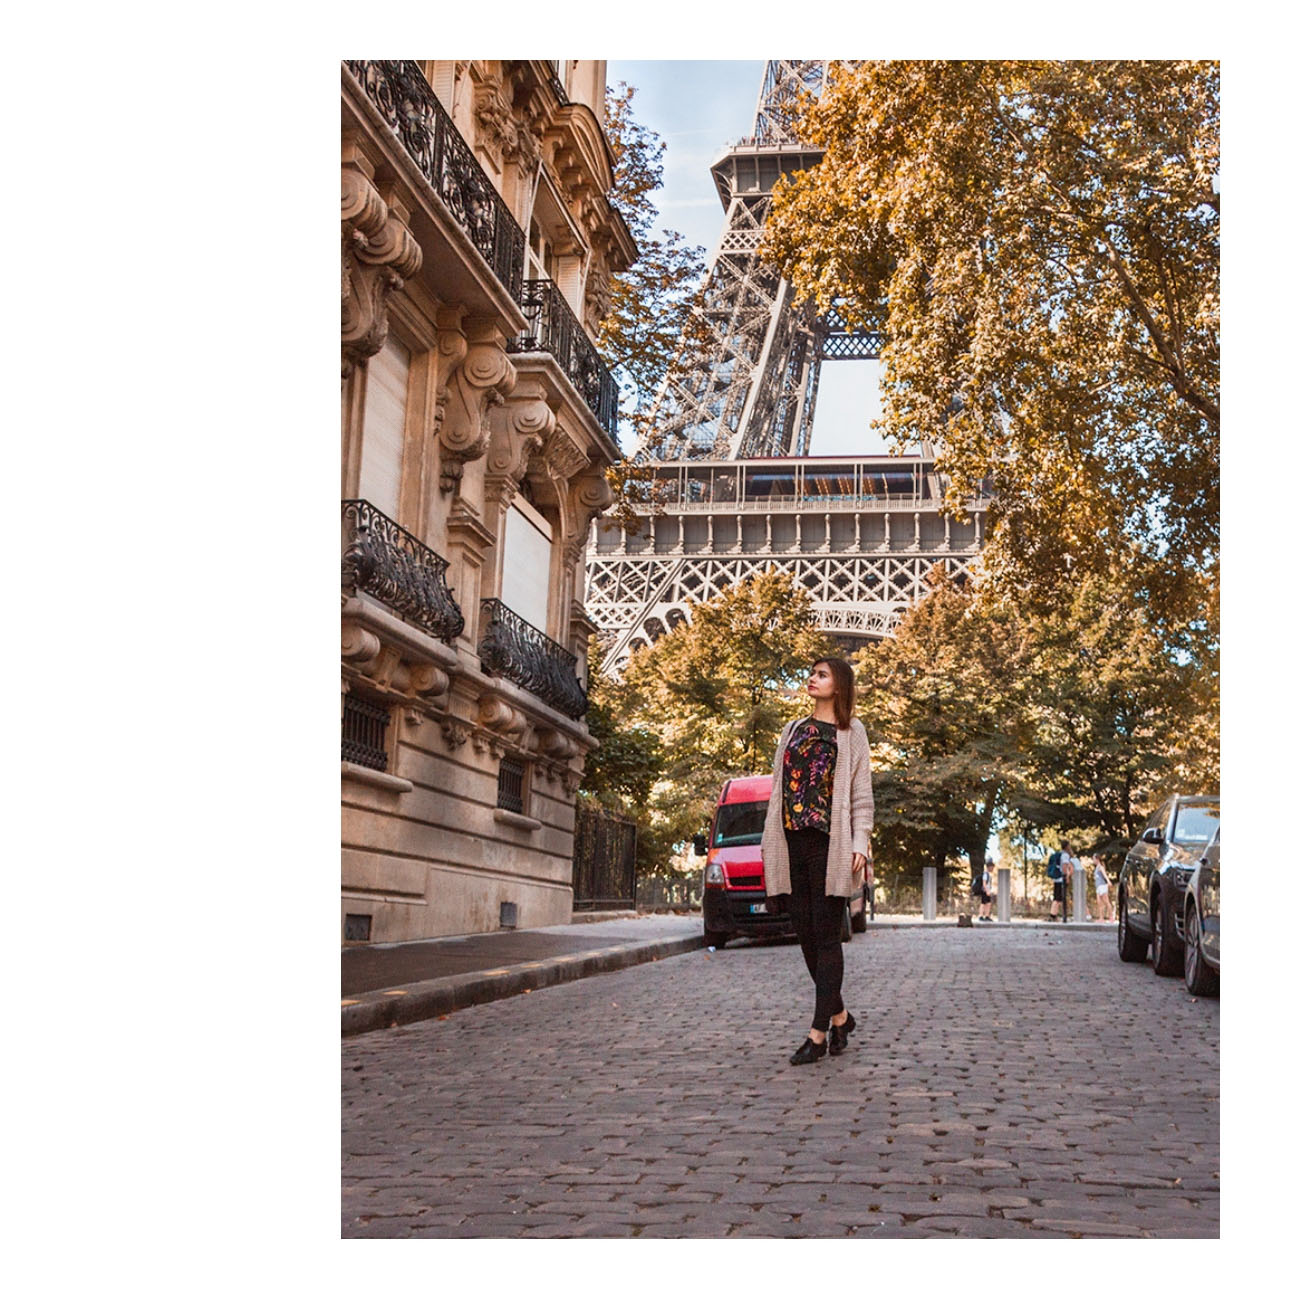 Paryż wieża Eiffela rue de universite